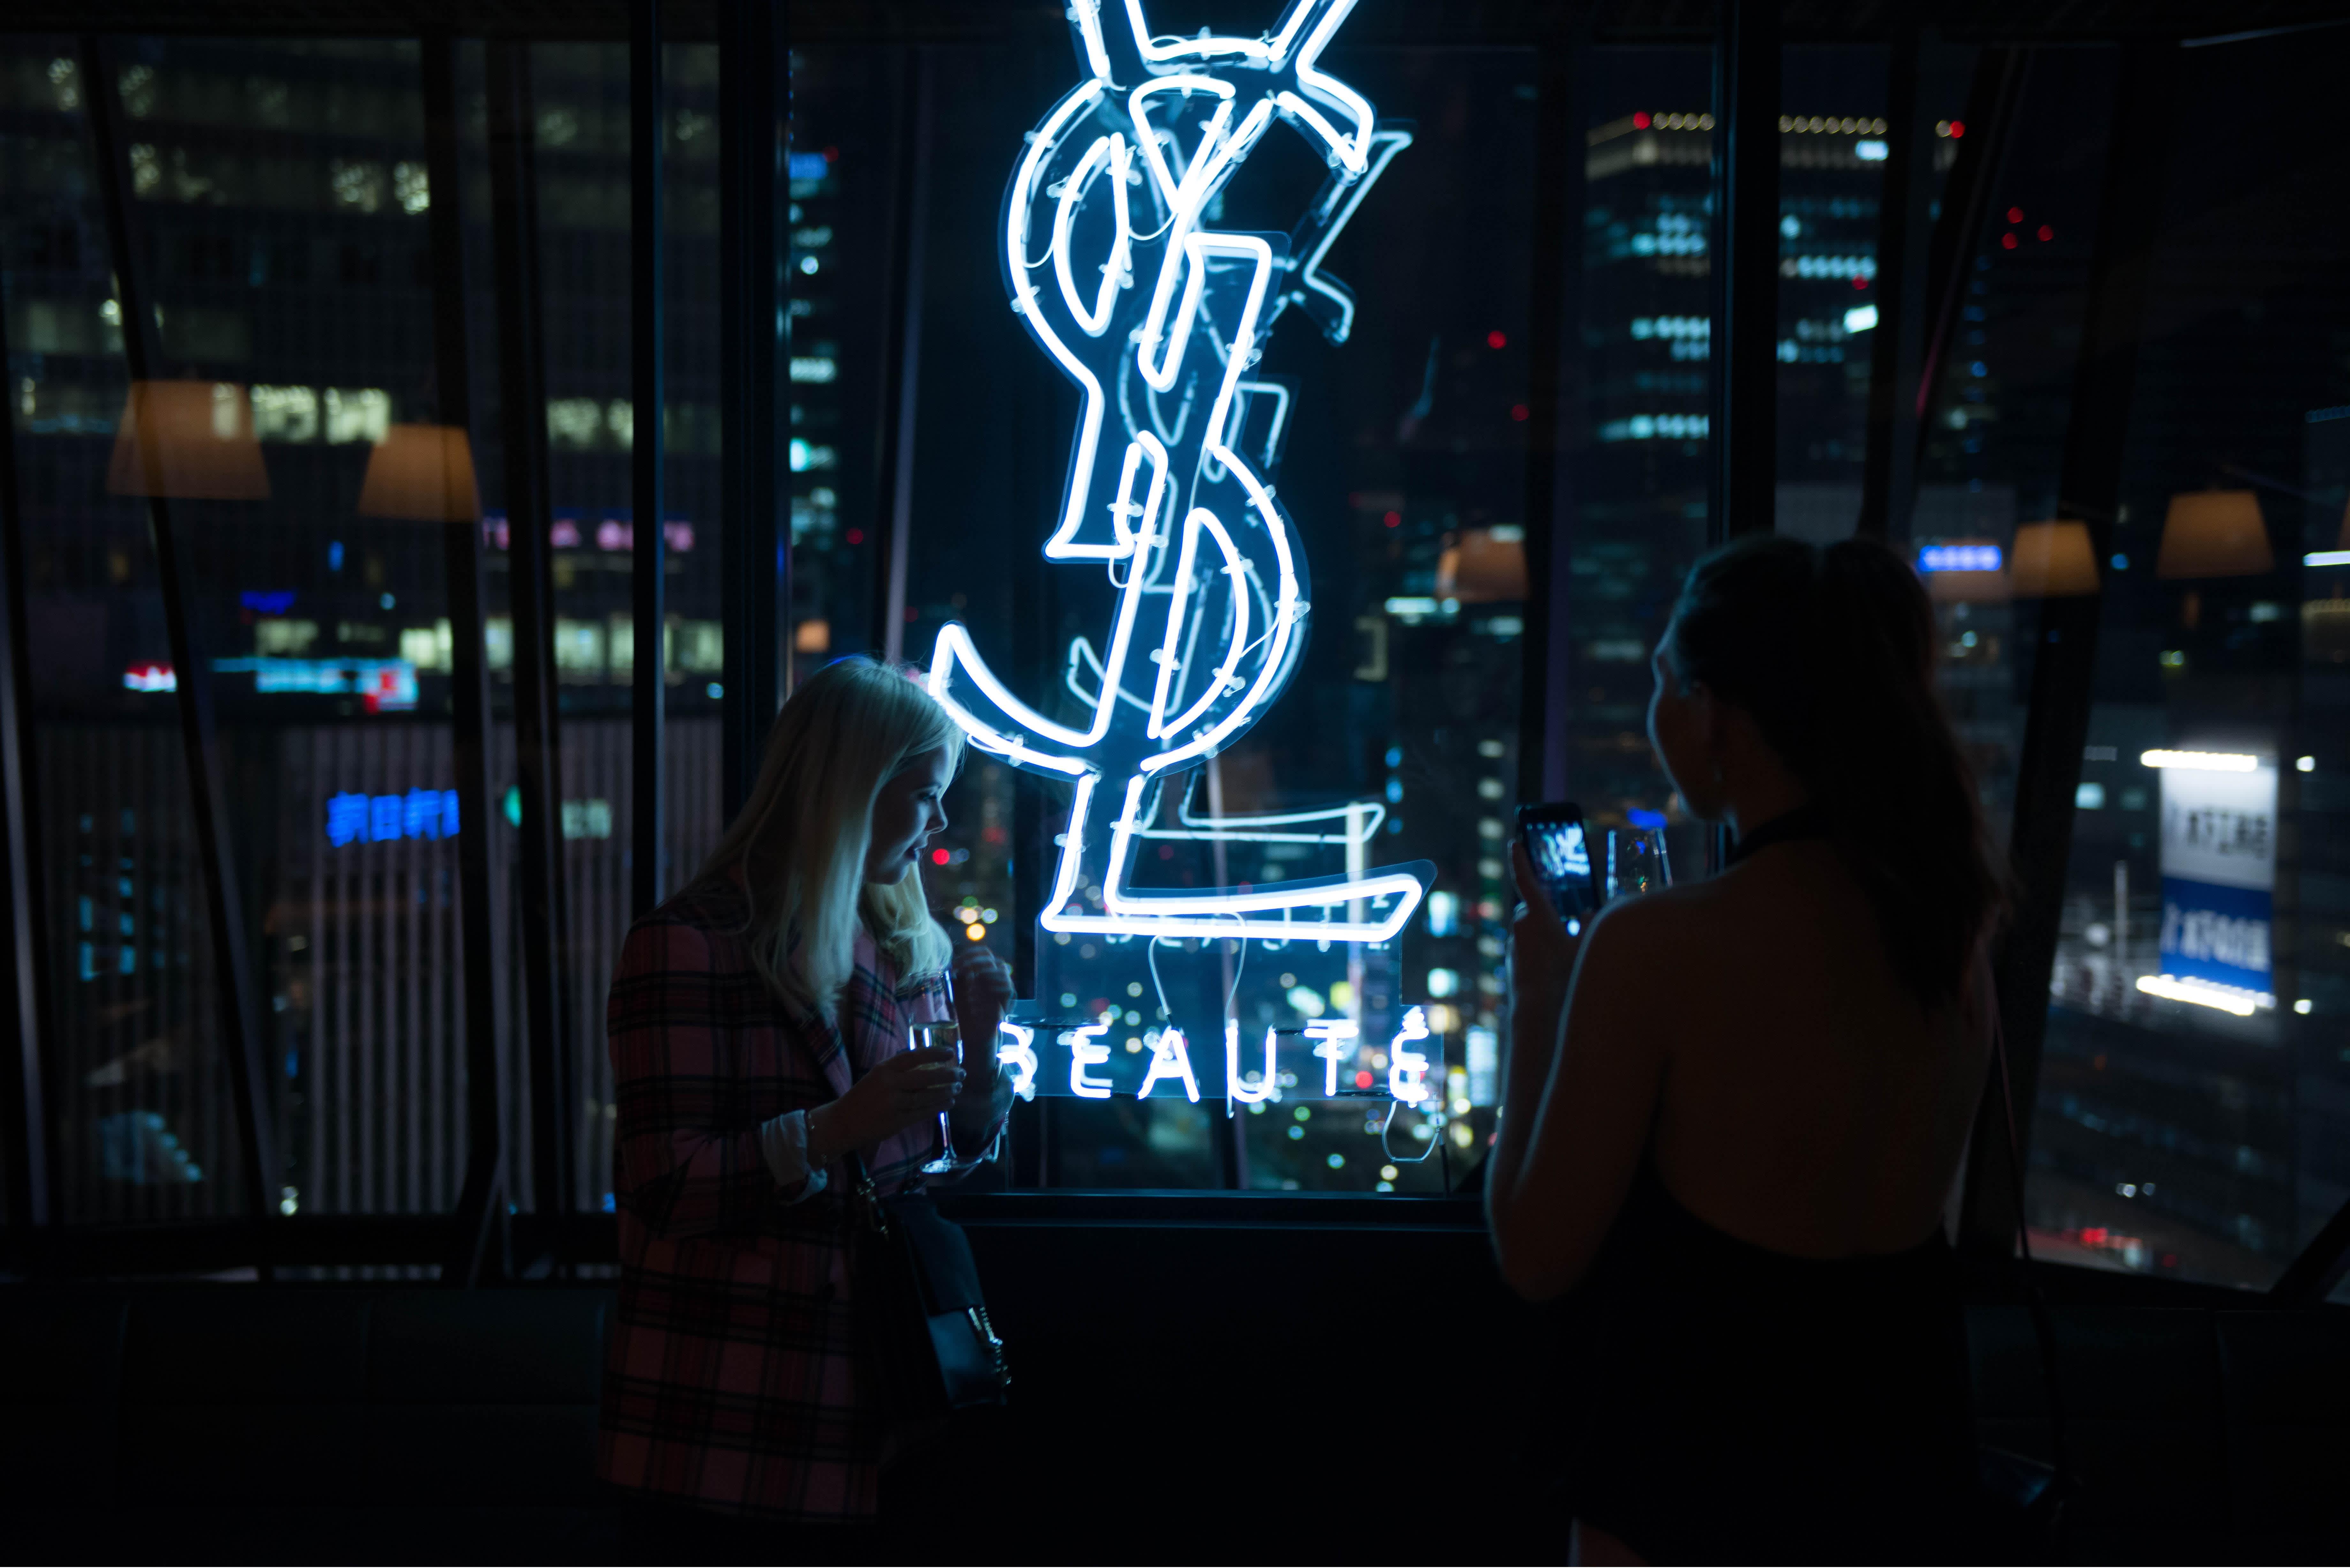 Yves Saint Laurent beauty- YSL - tokyo trip influencer - content - brand content - logistic - sato creative